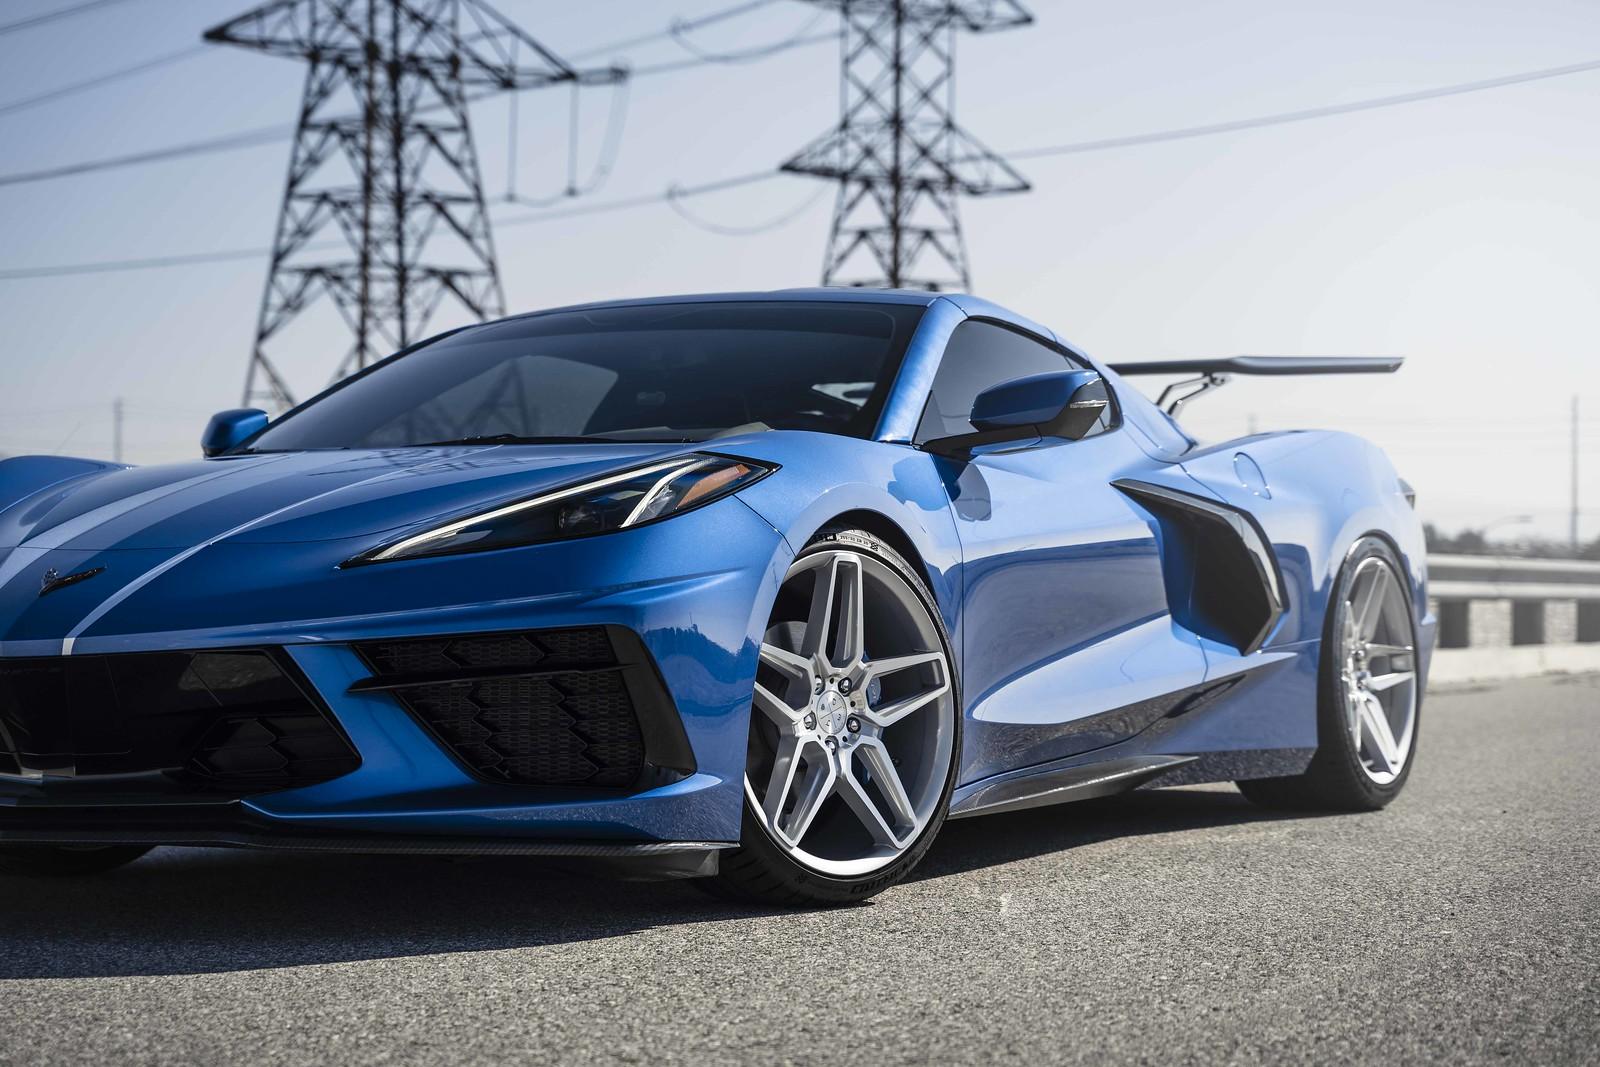 2020_Chevrolet_Corvette_C8_BD17_5_Silver_w-_Machined_Face_-13